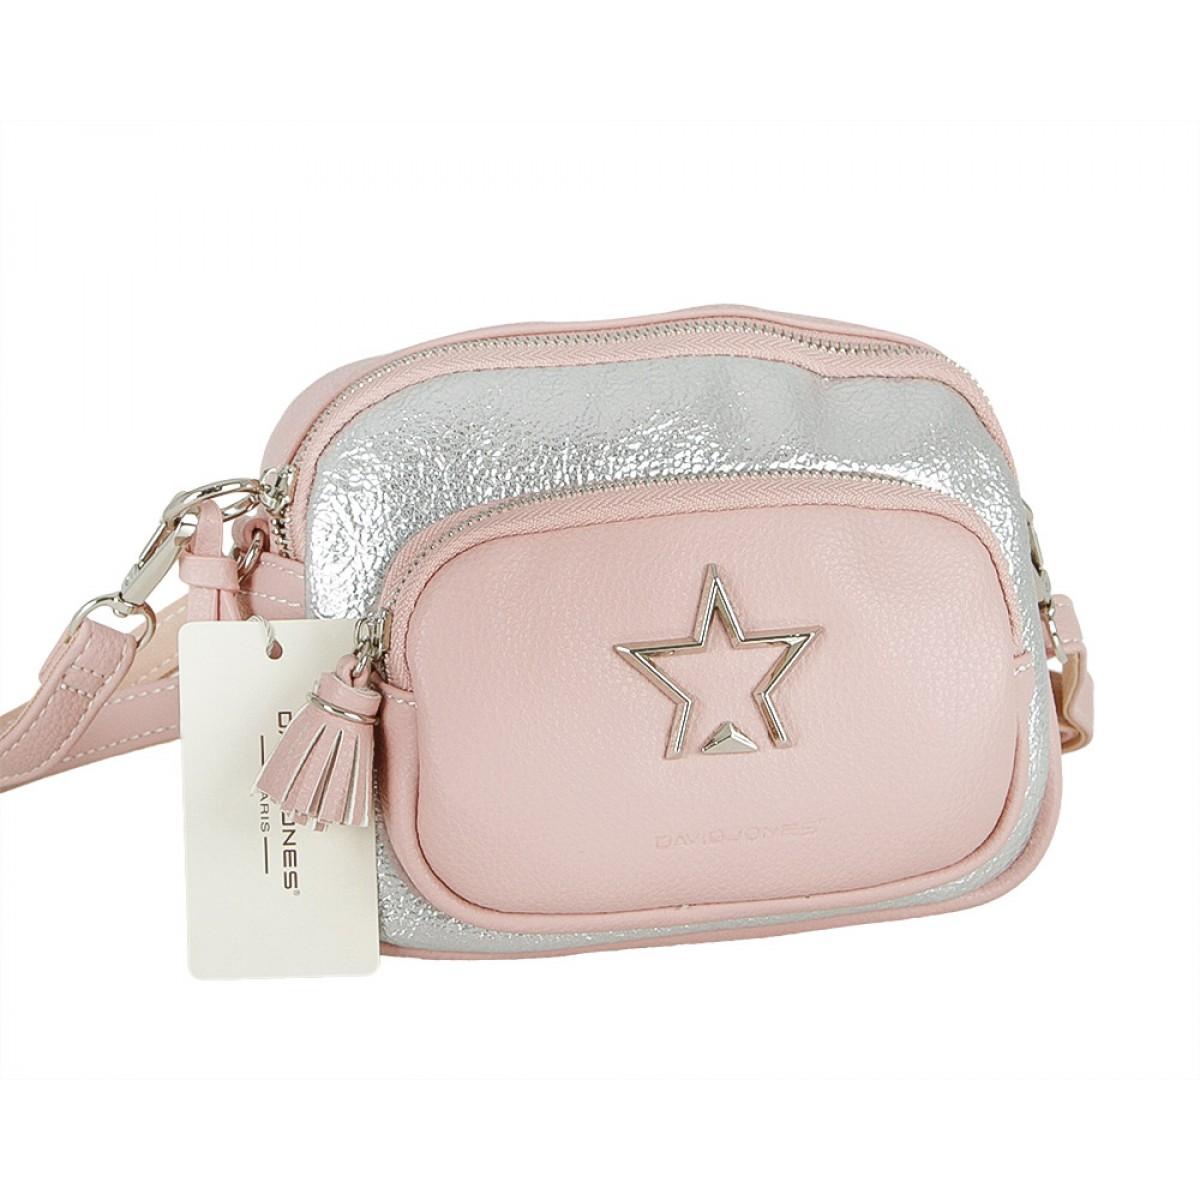 Жіноча сумка David Jones 5955-1 PINK